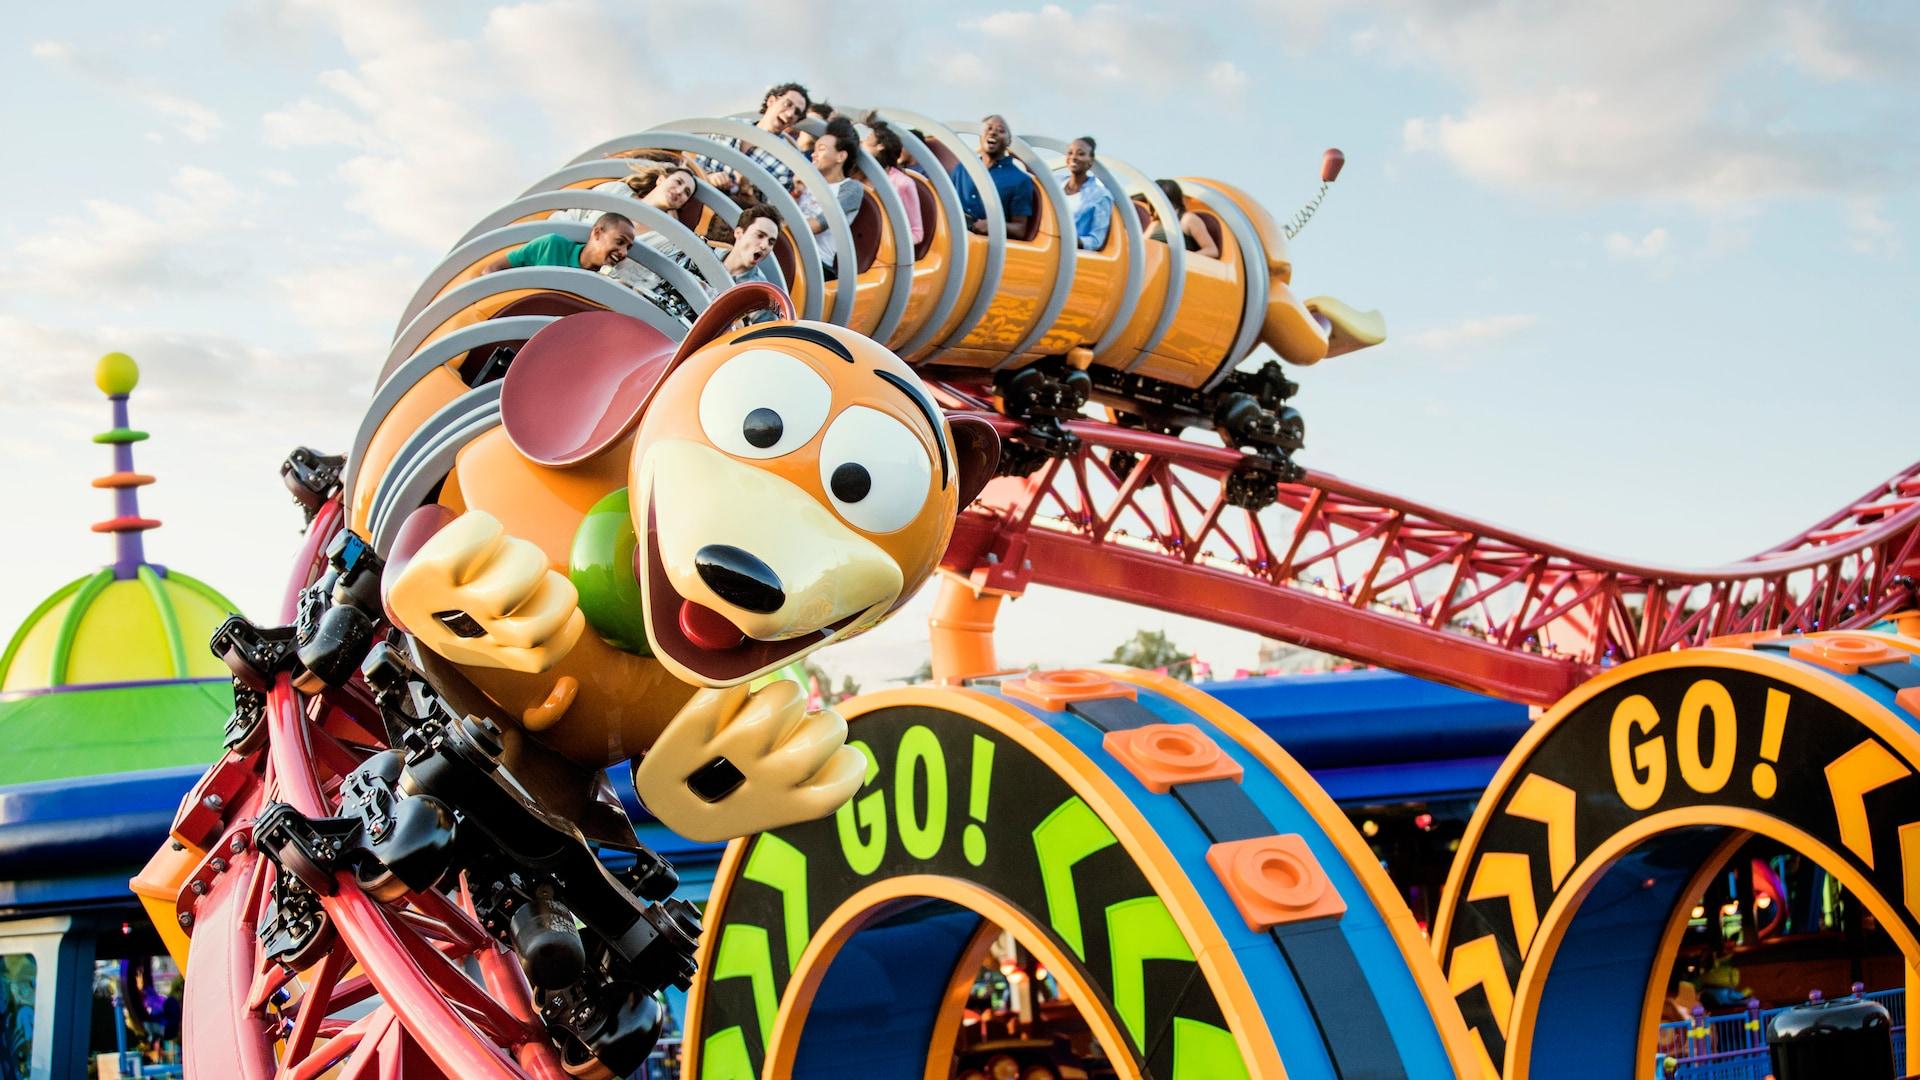 Slinky Dog Dash Roller Coaster at Toy Story Land | Walt Disney World Resort